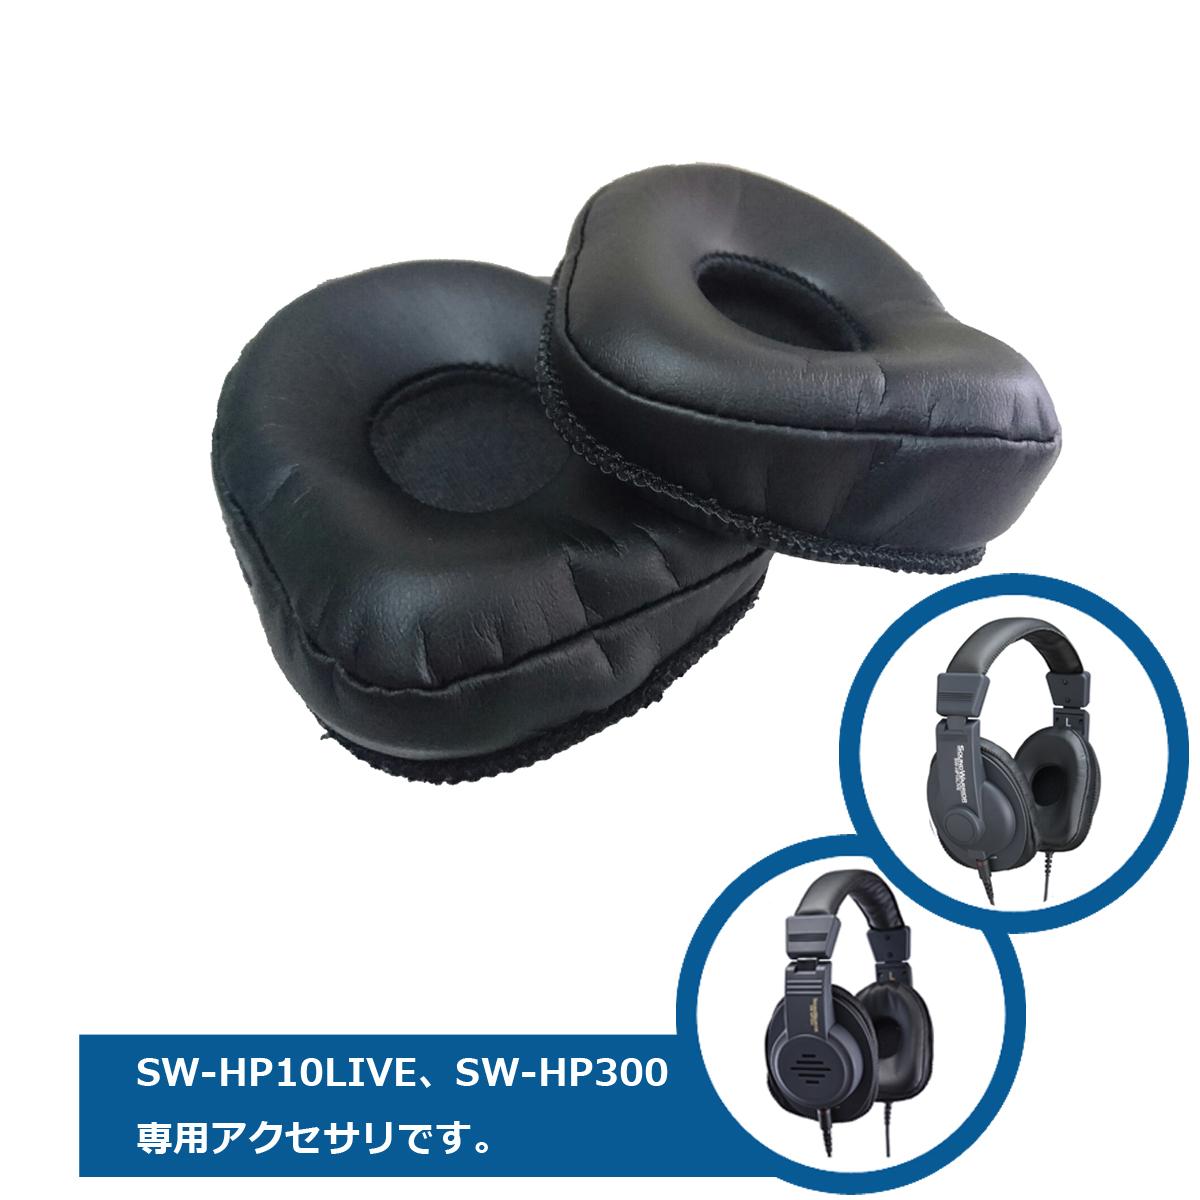 SWA-HP300-EP SW-HP10LIVE/HP300対応 交換用イヤーパッド(左右セット) [城下工業]